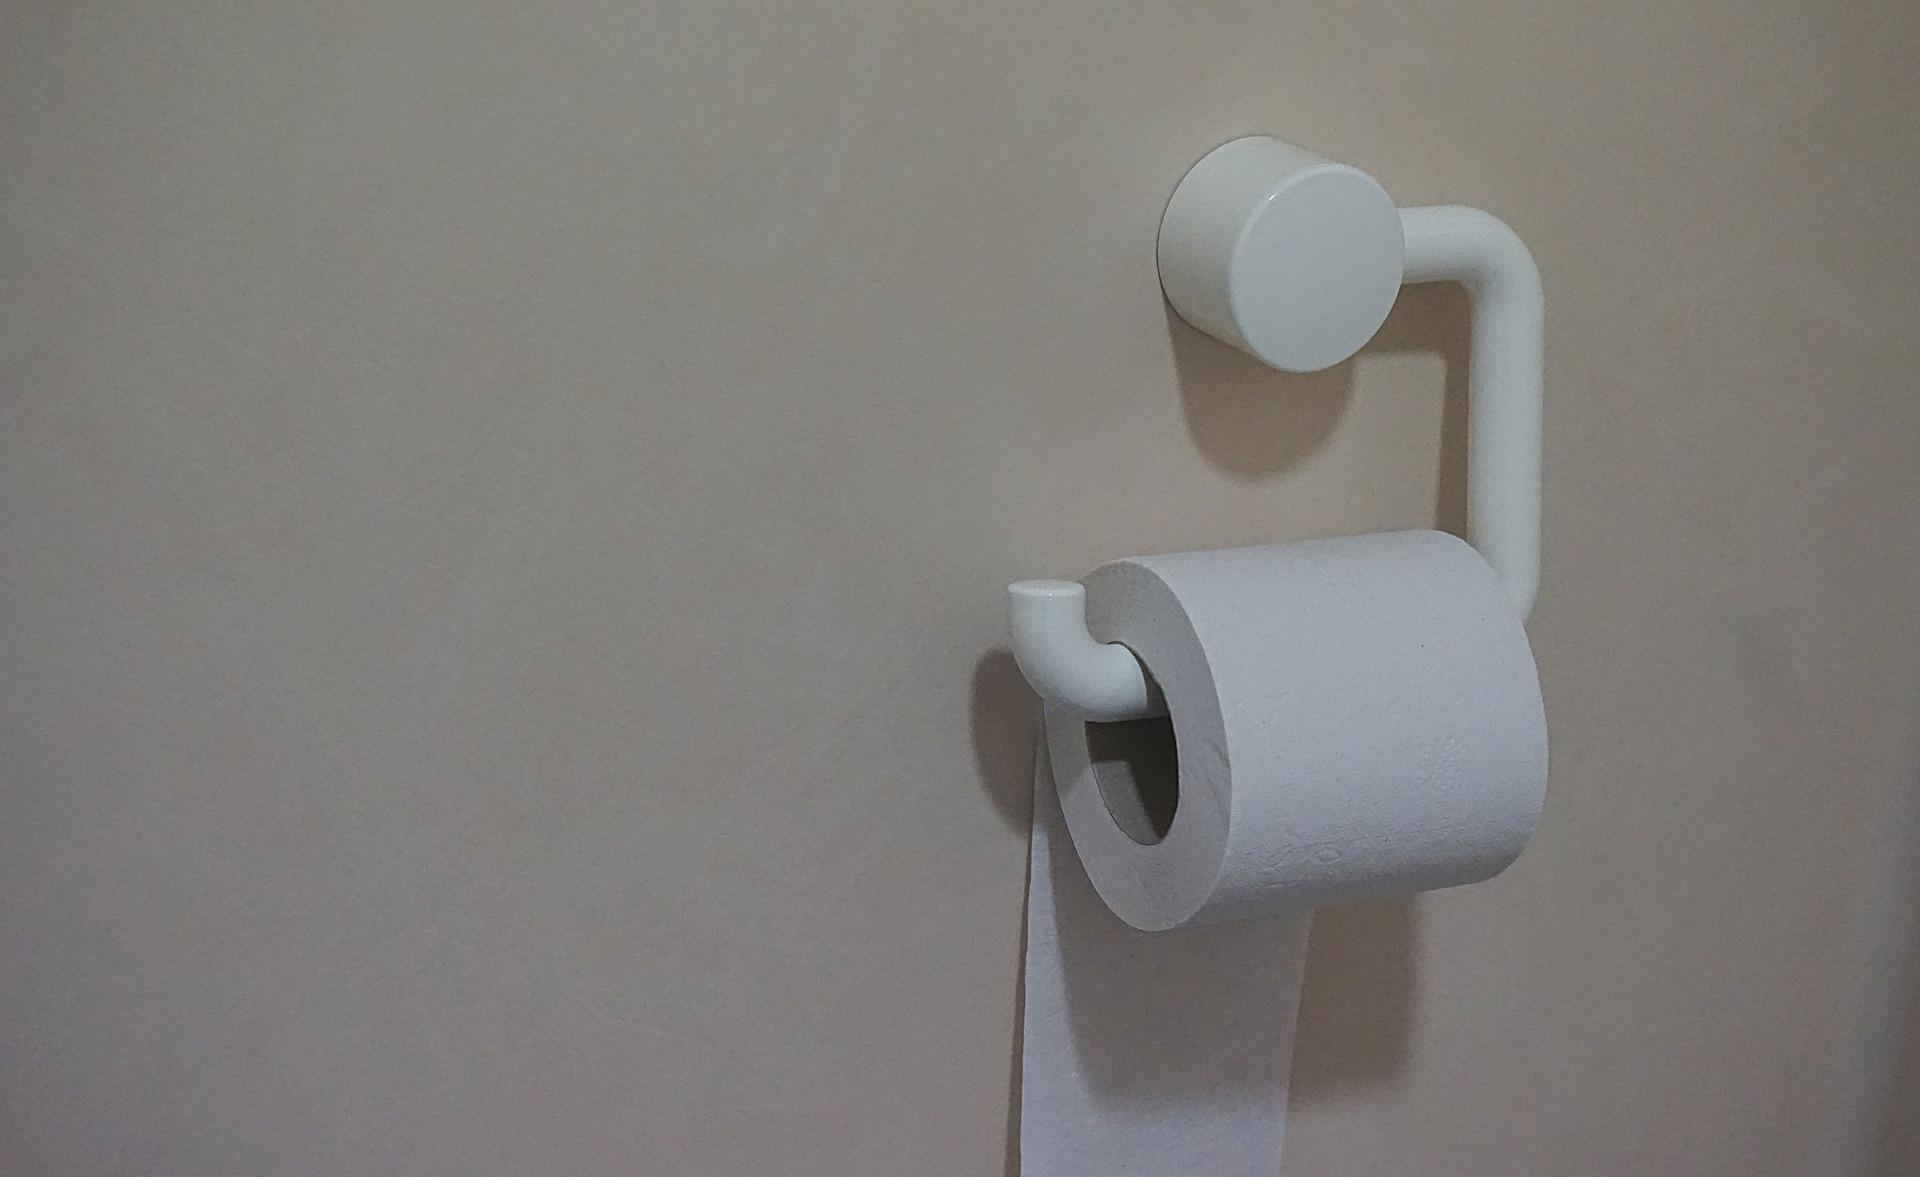 toilet paper-2588827_1920